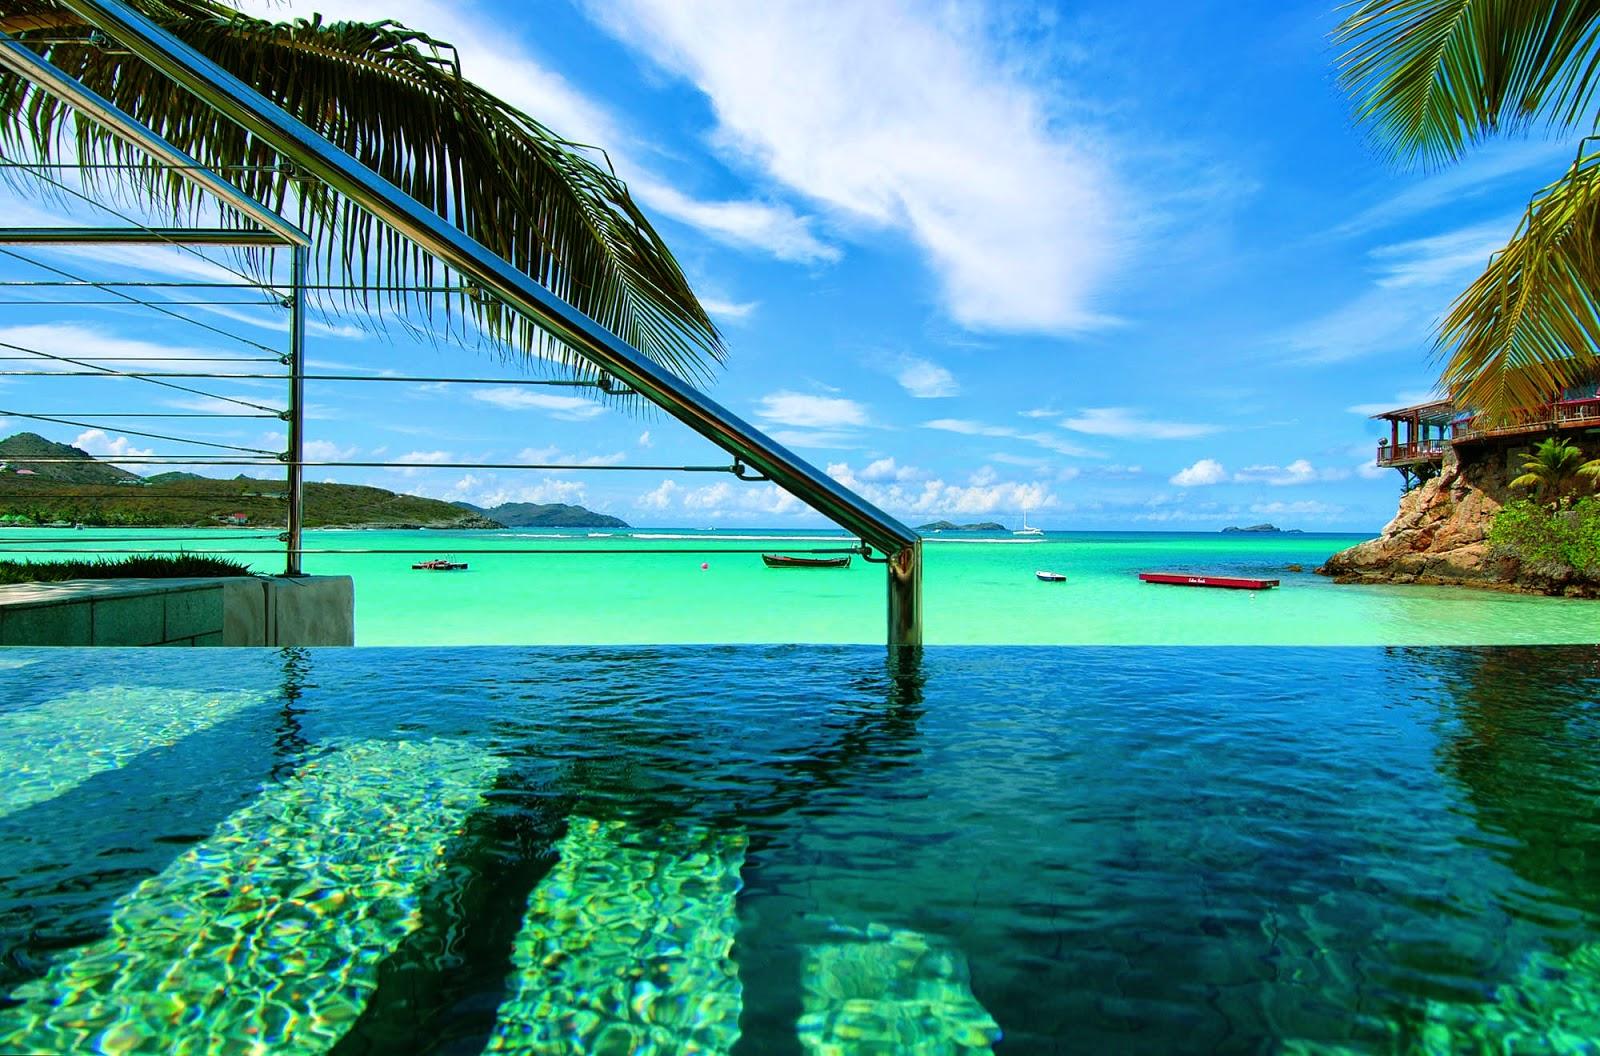 Best Island Beaches For Partying Mykonos St Barts: 15 Most Luxurious Honeymoon Destinations